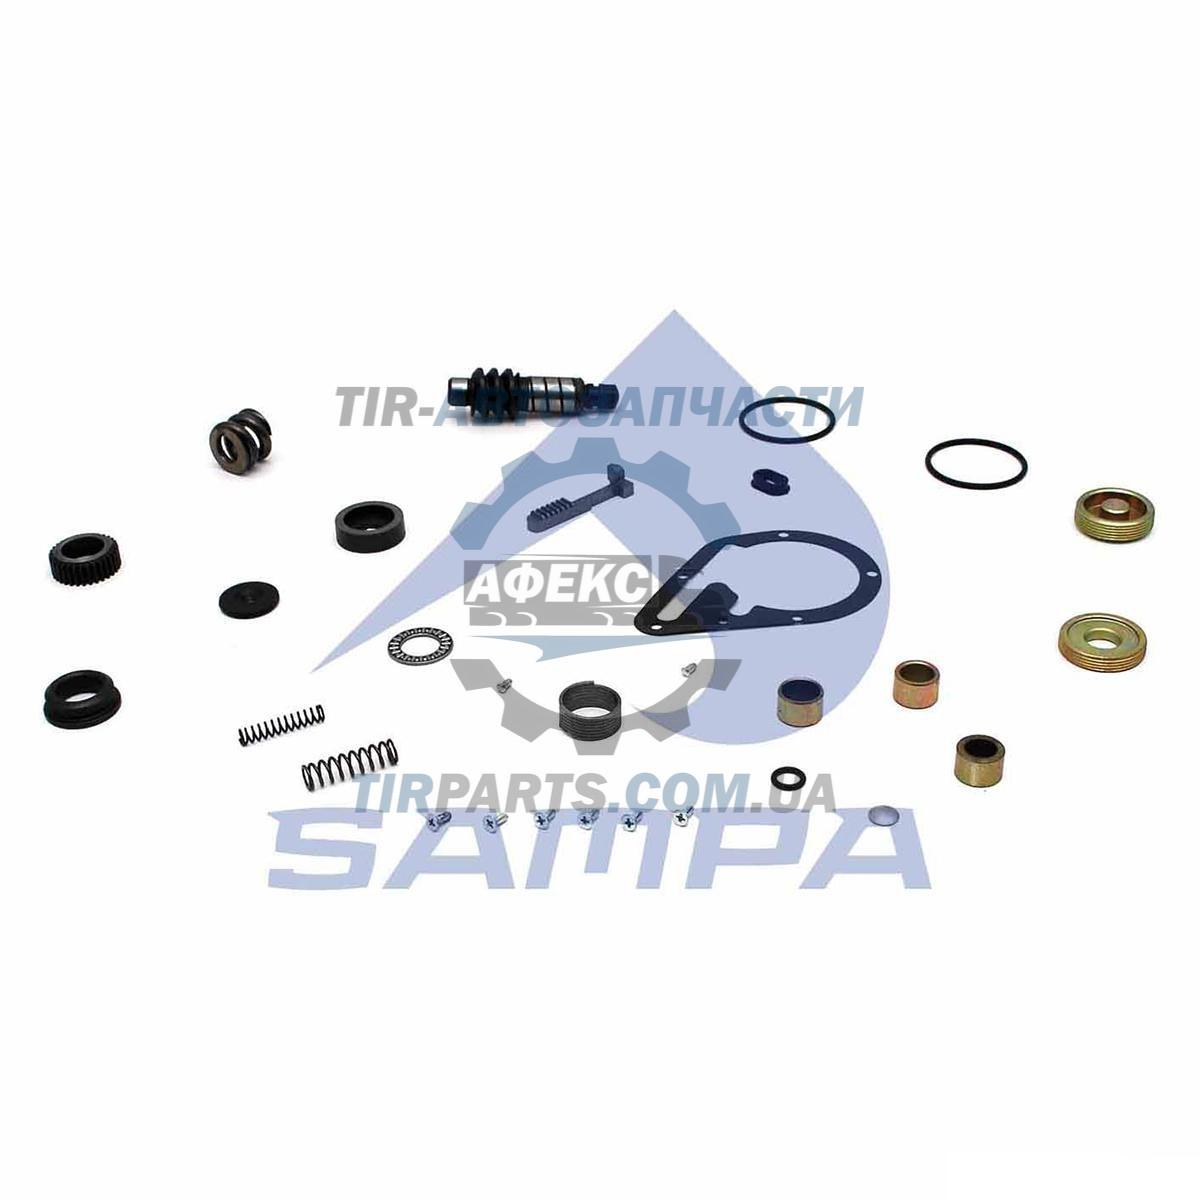 Ремкомплект Сервомеханизм рычажного привода d14x160x155? / Double Bent Volvo (0004200092 | 040.653)